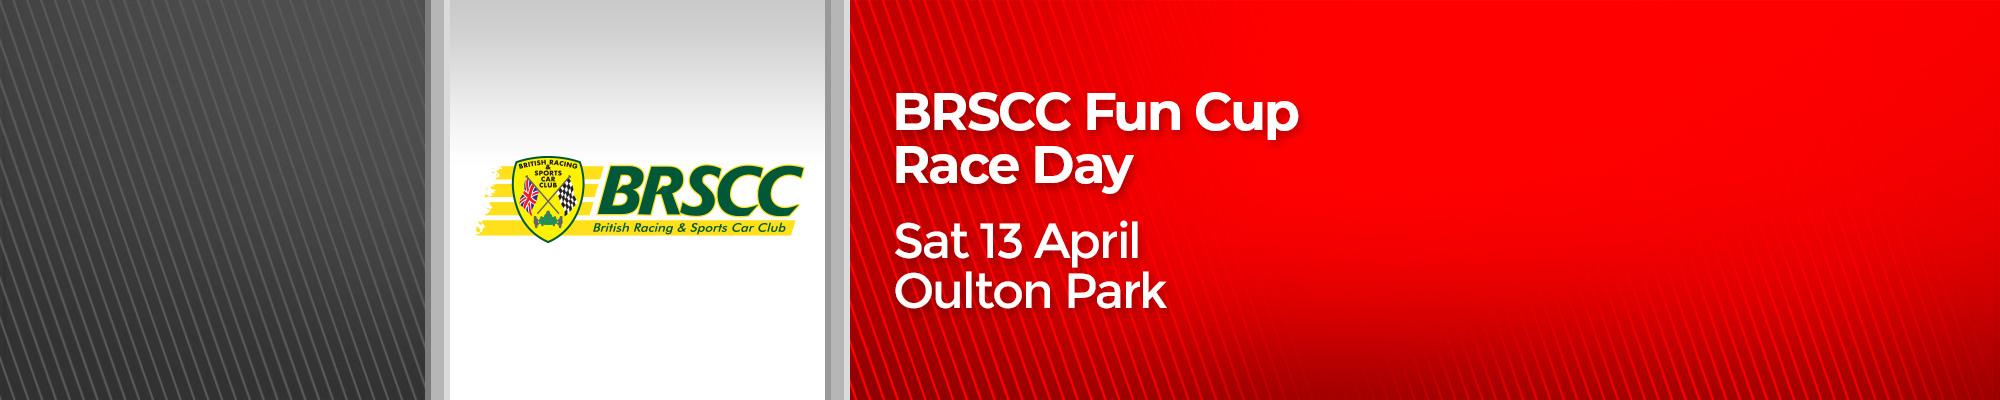 BRSCC Fun Cup Race Day